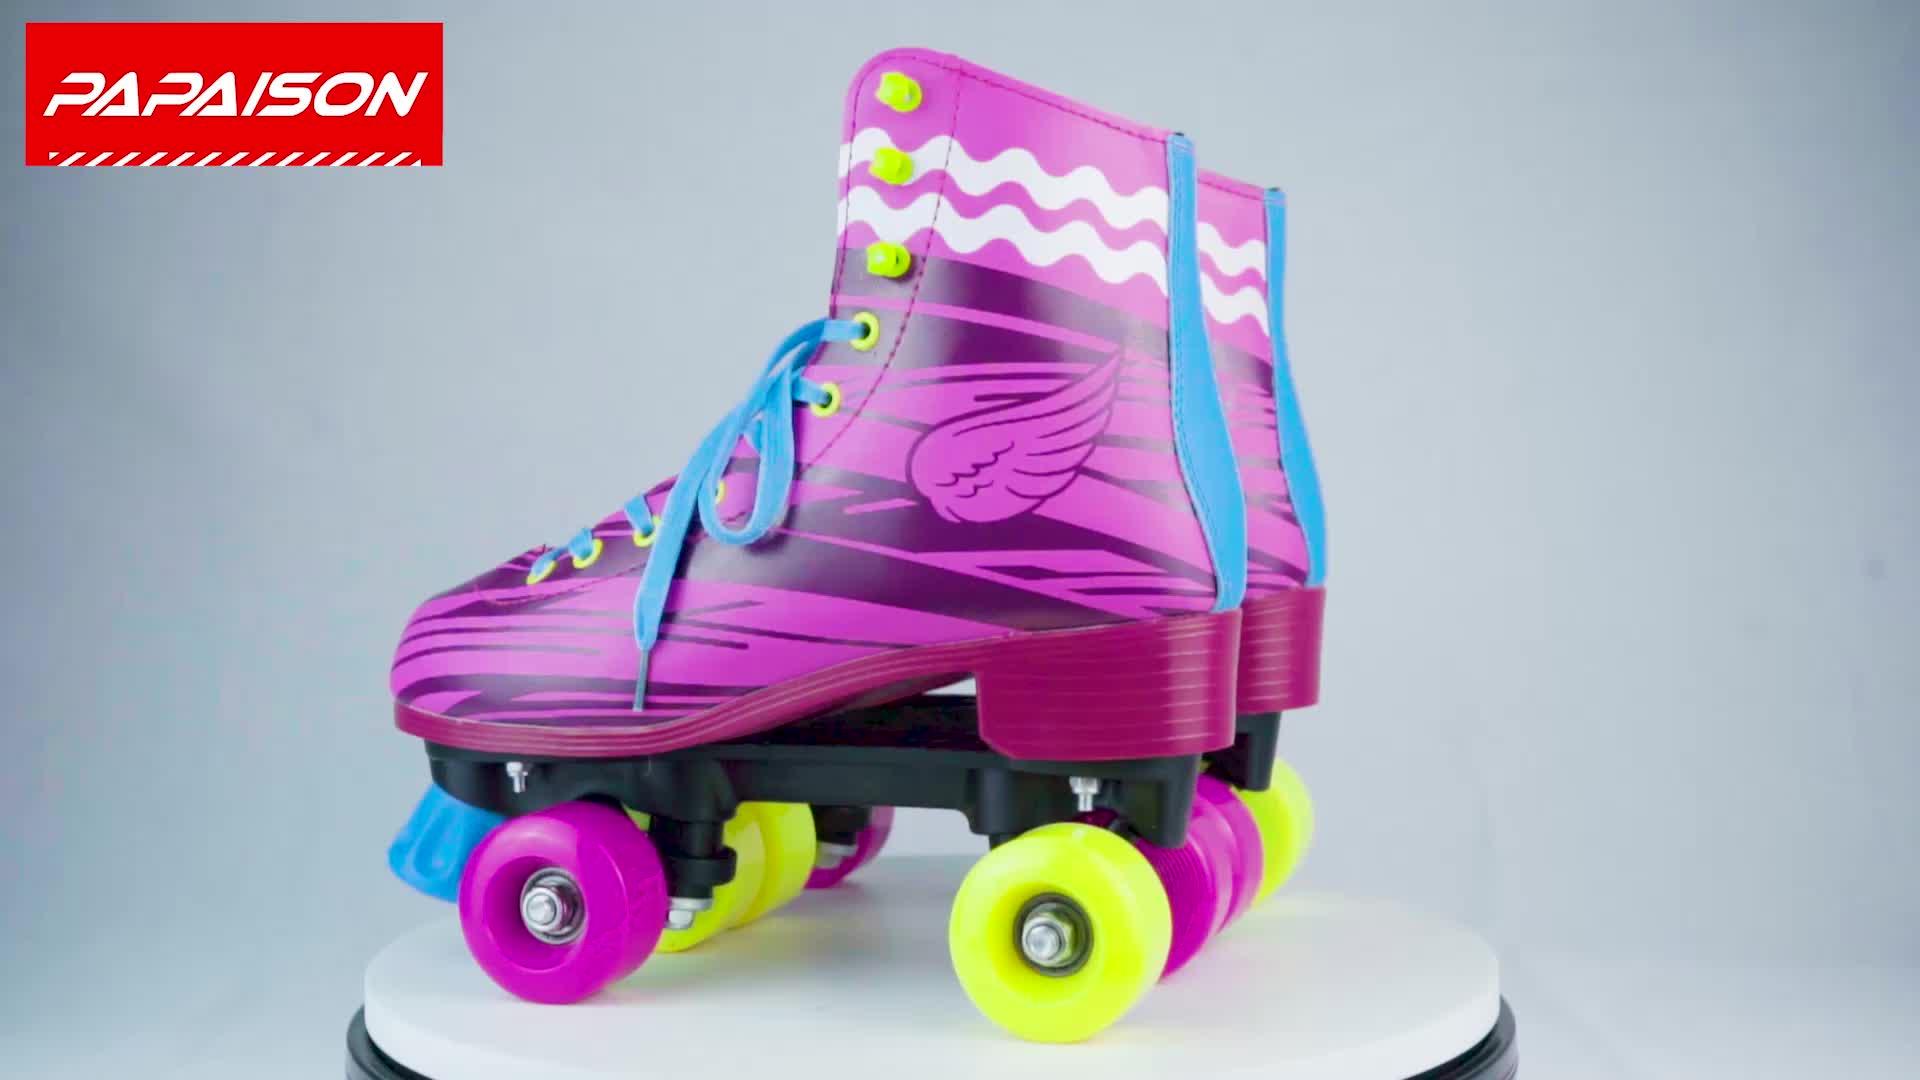 Factory promotion PVC leather 4 wheels soy luna patins quad roller skates